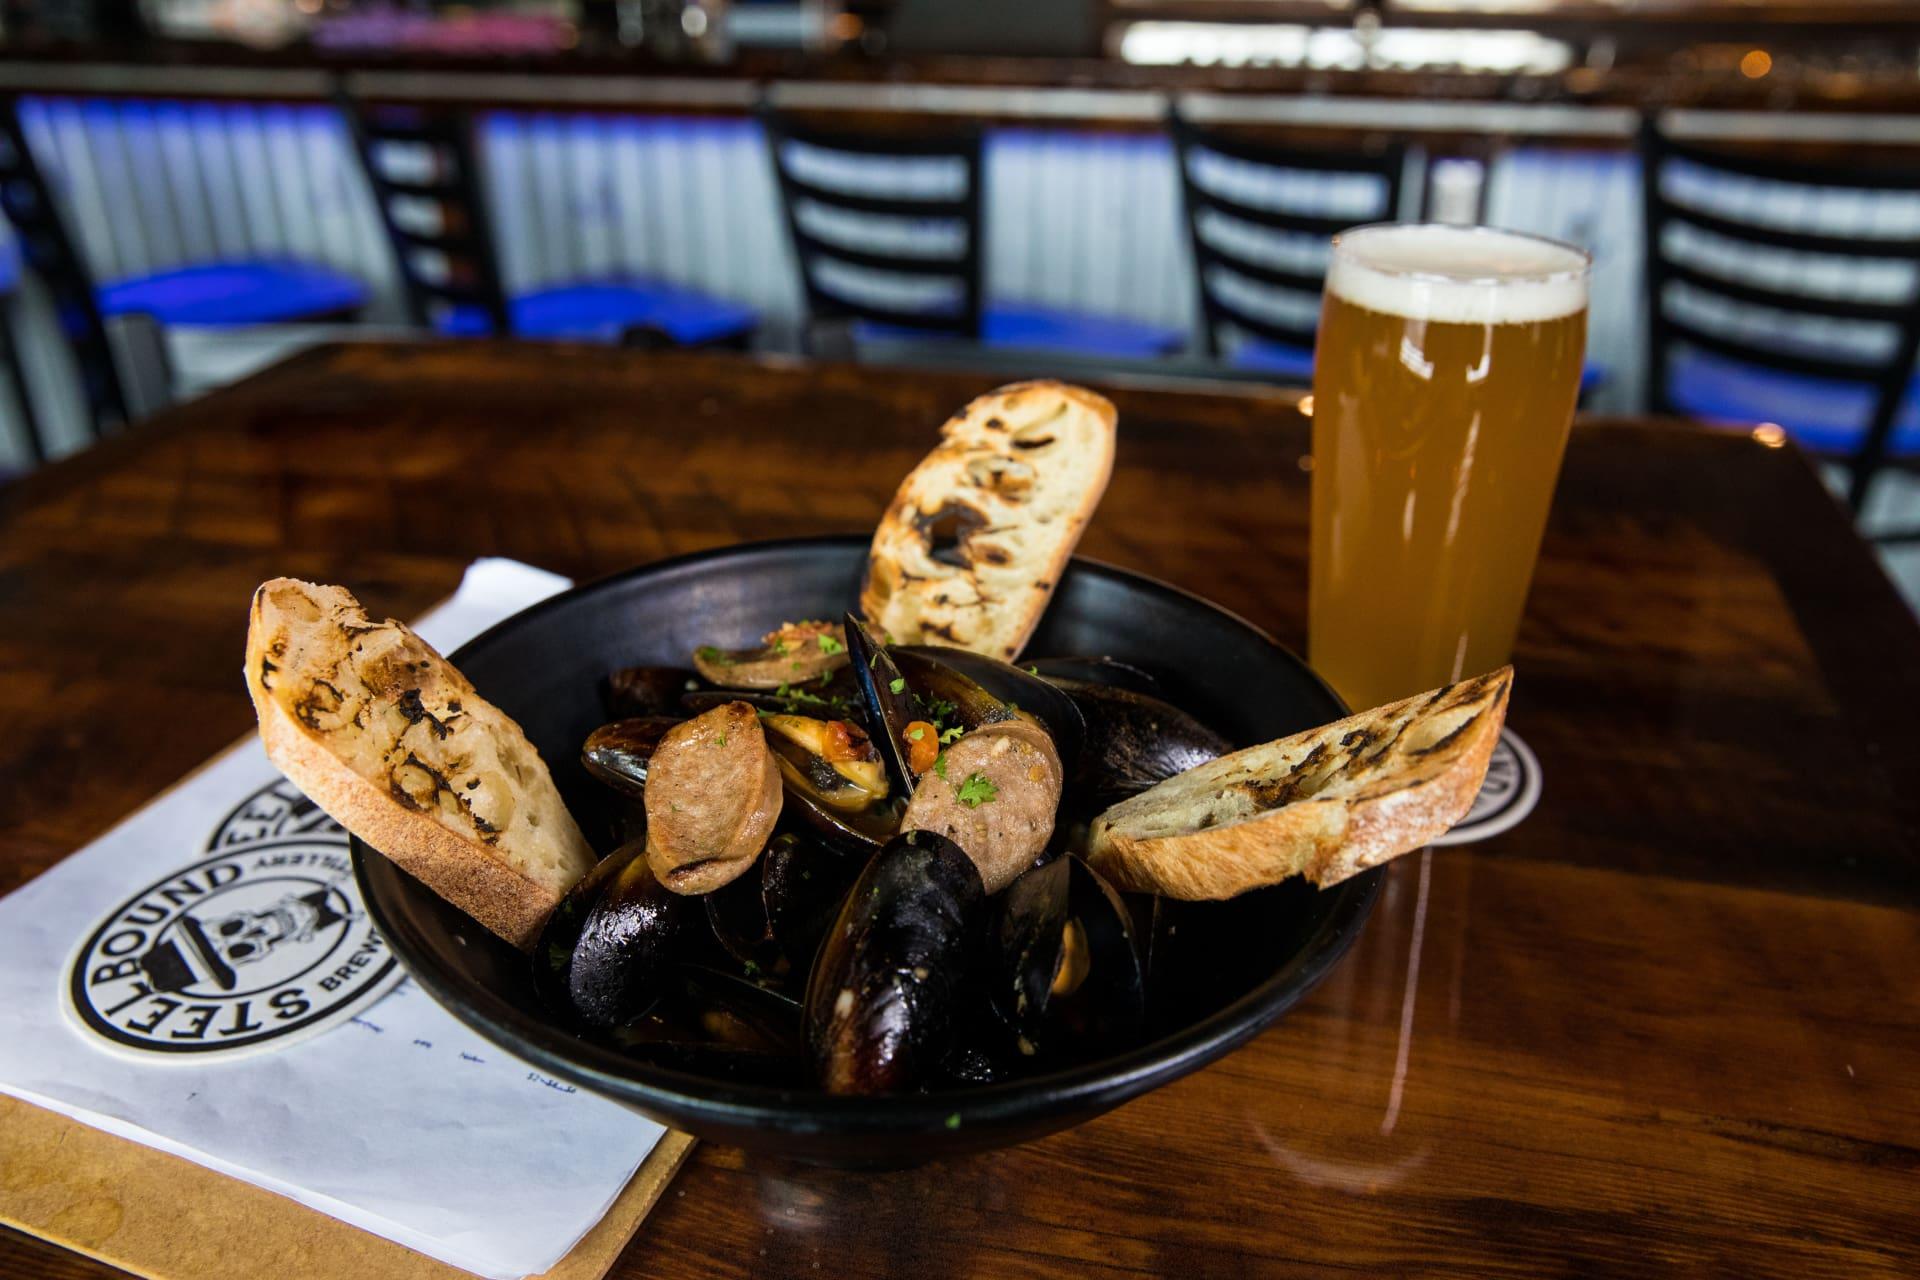 EVL Steamed Mussels